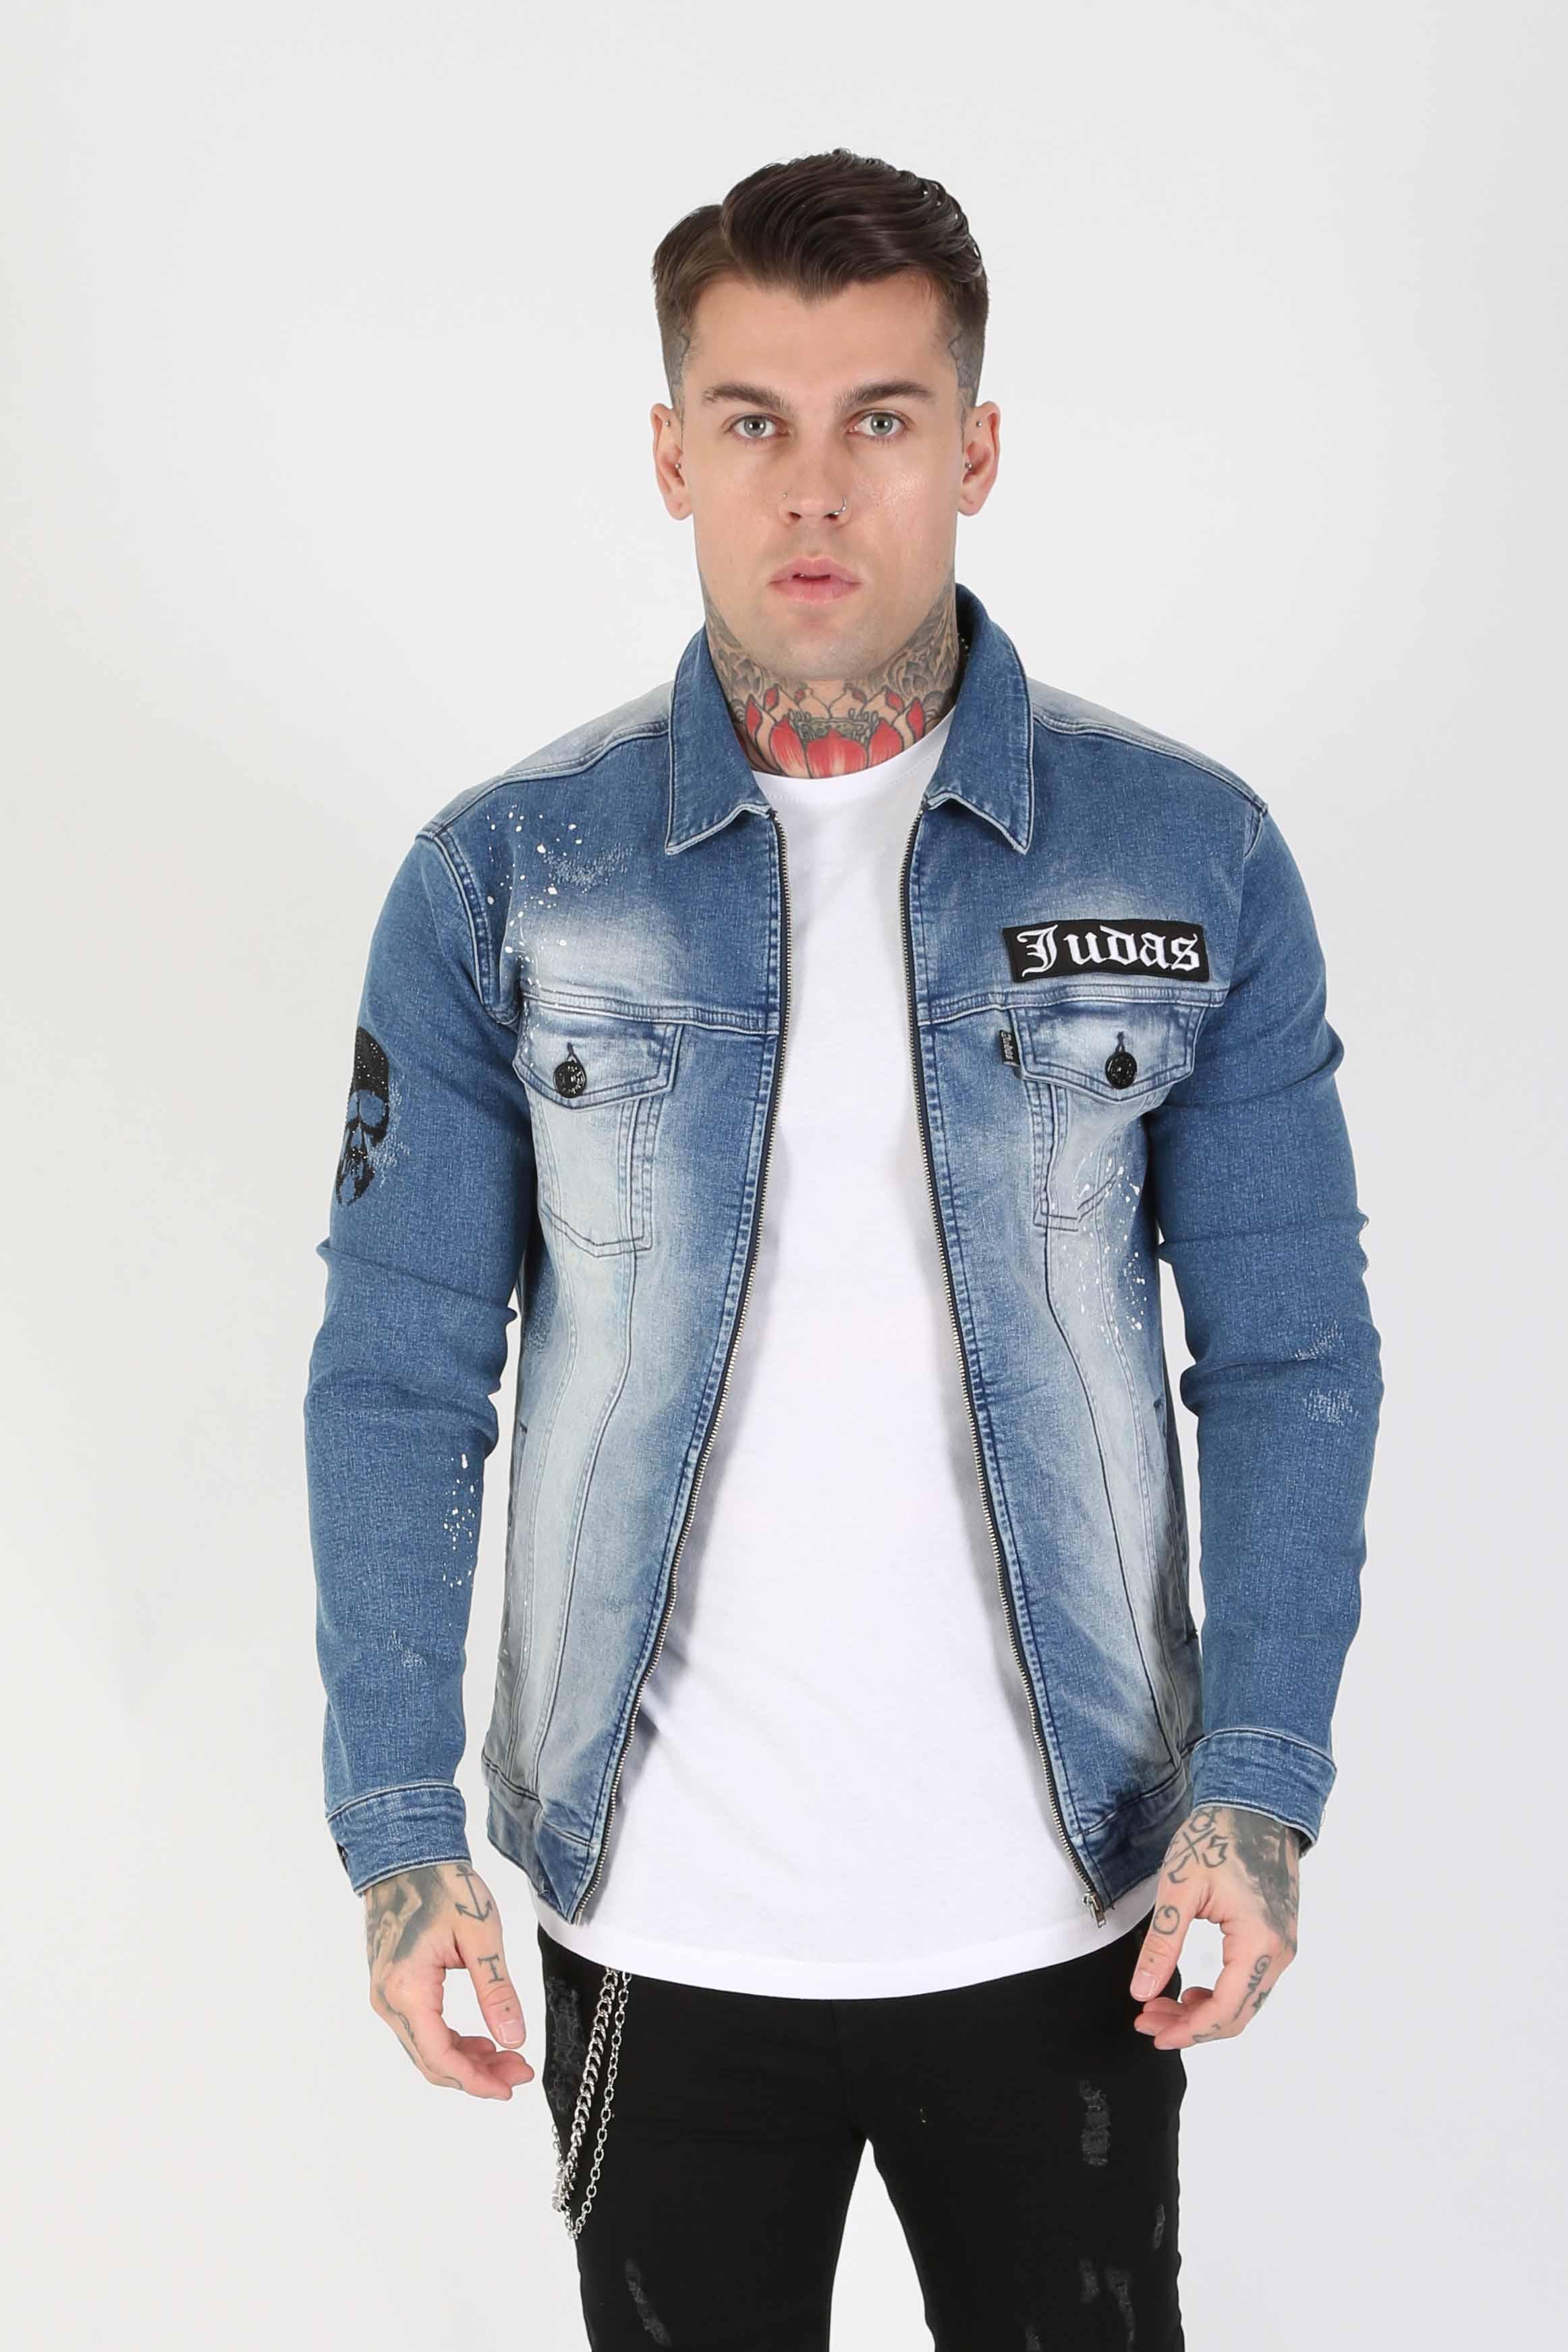 Thrasher Fitted Men's Denim Jacket - Blue, Small